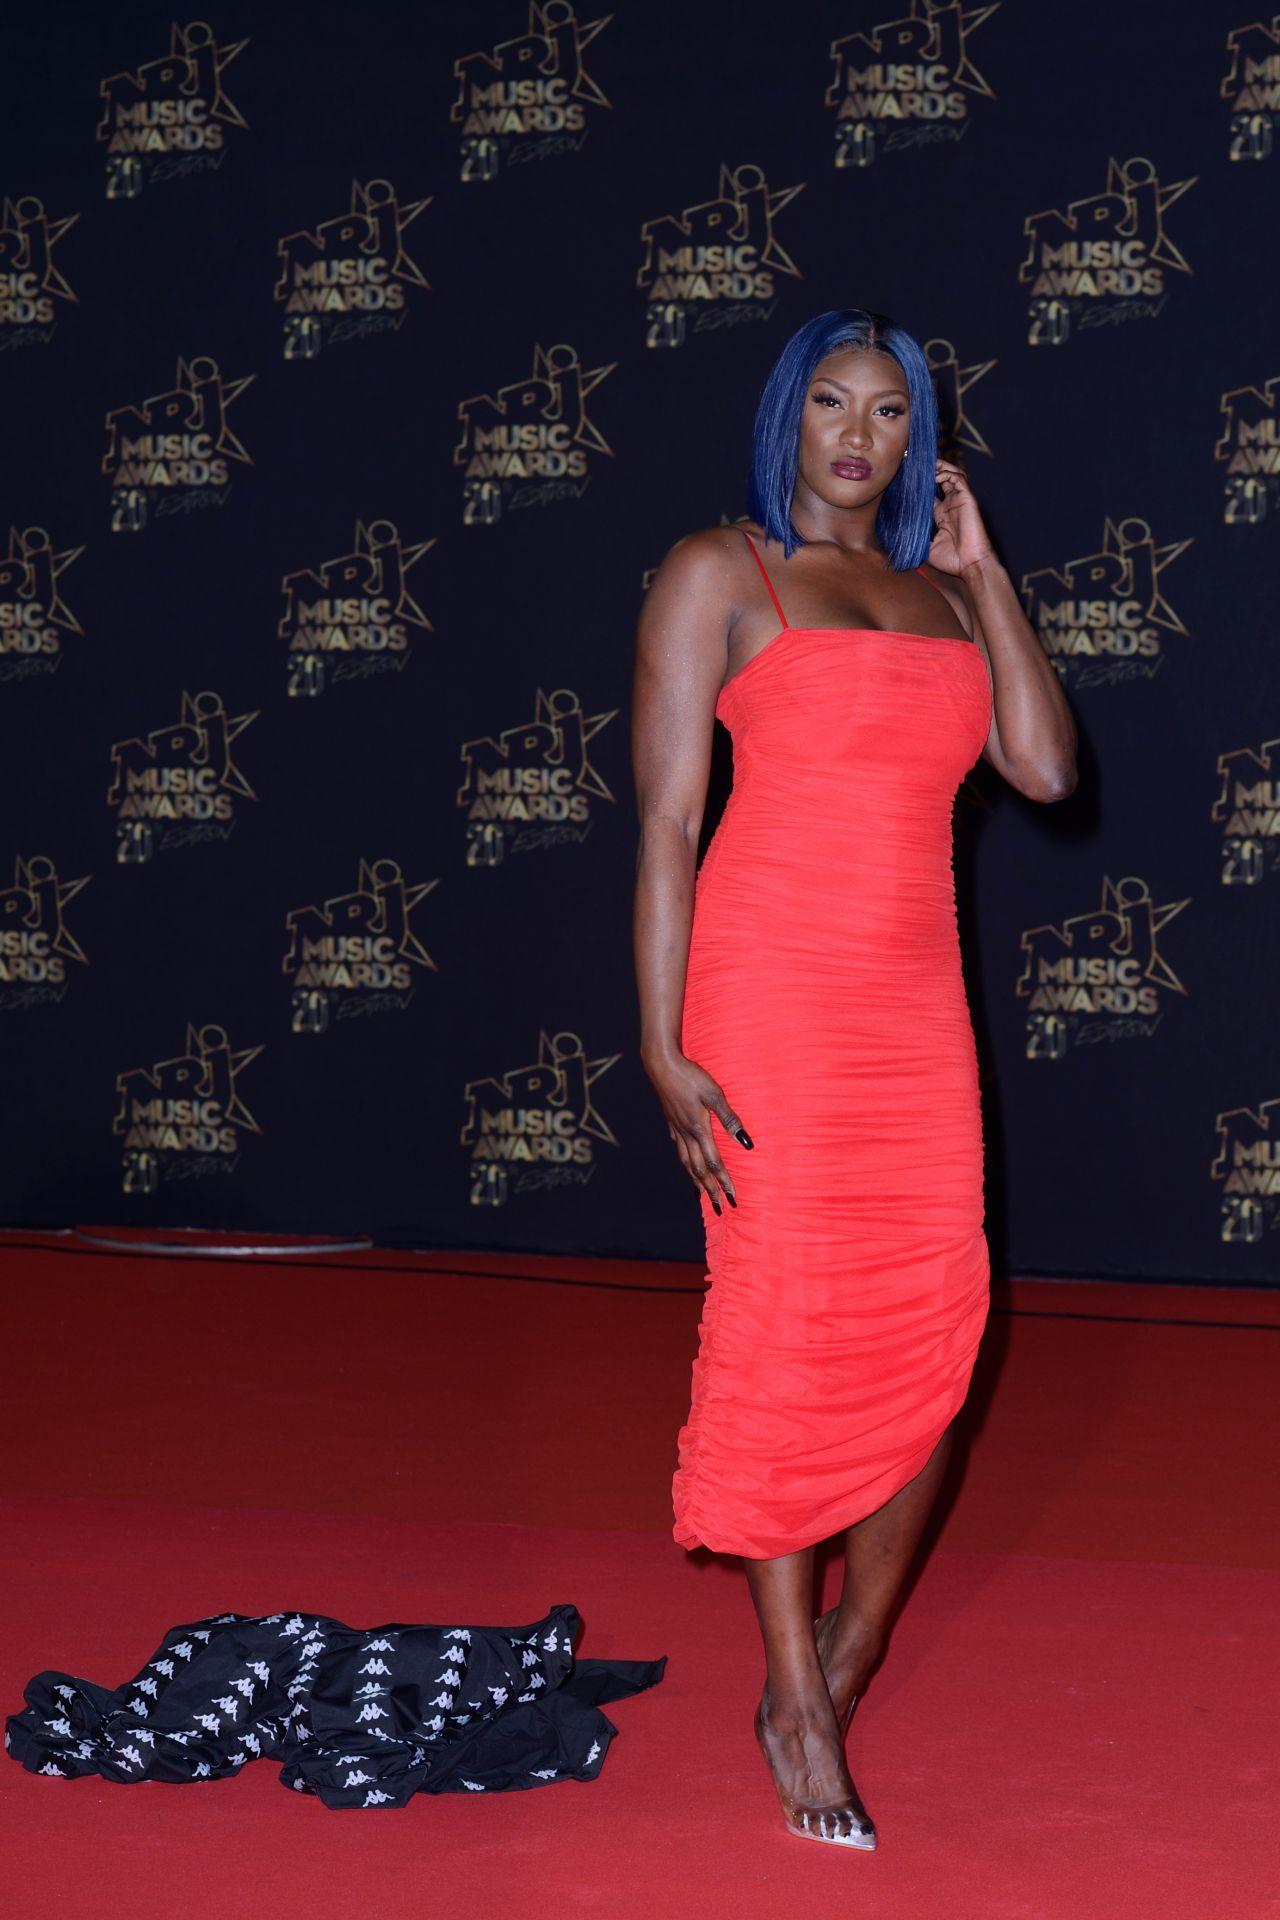 Aya Nakamura 2018 Nrj Music Awards In Cannes